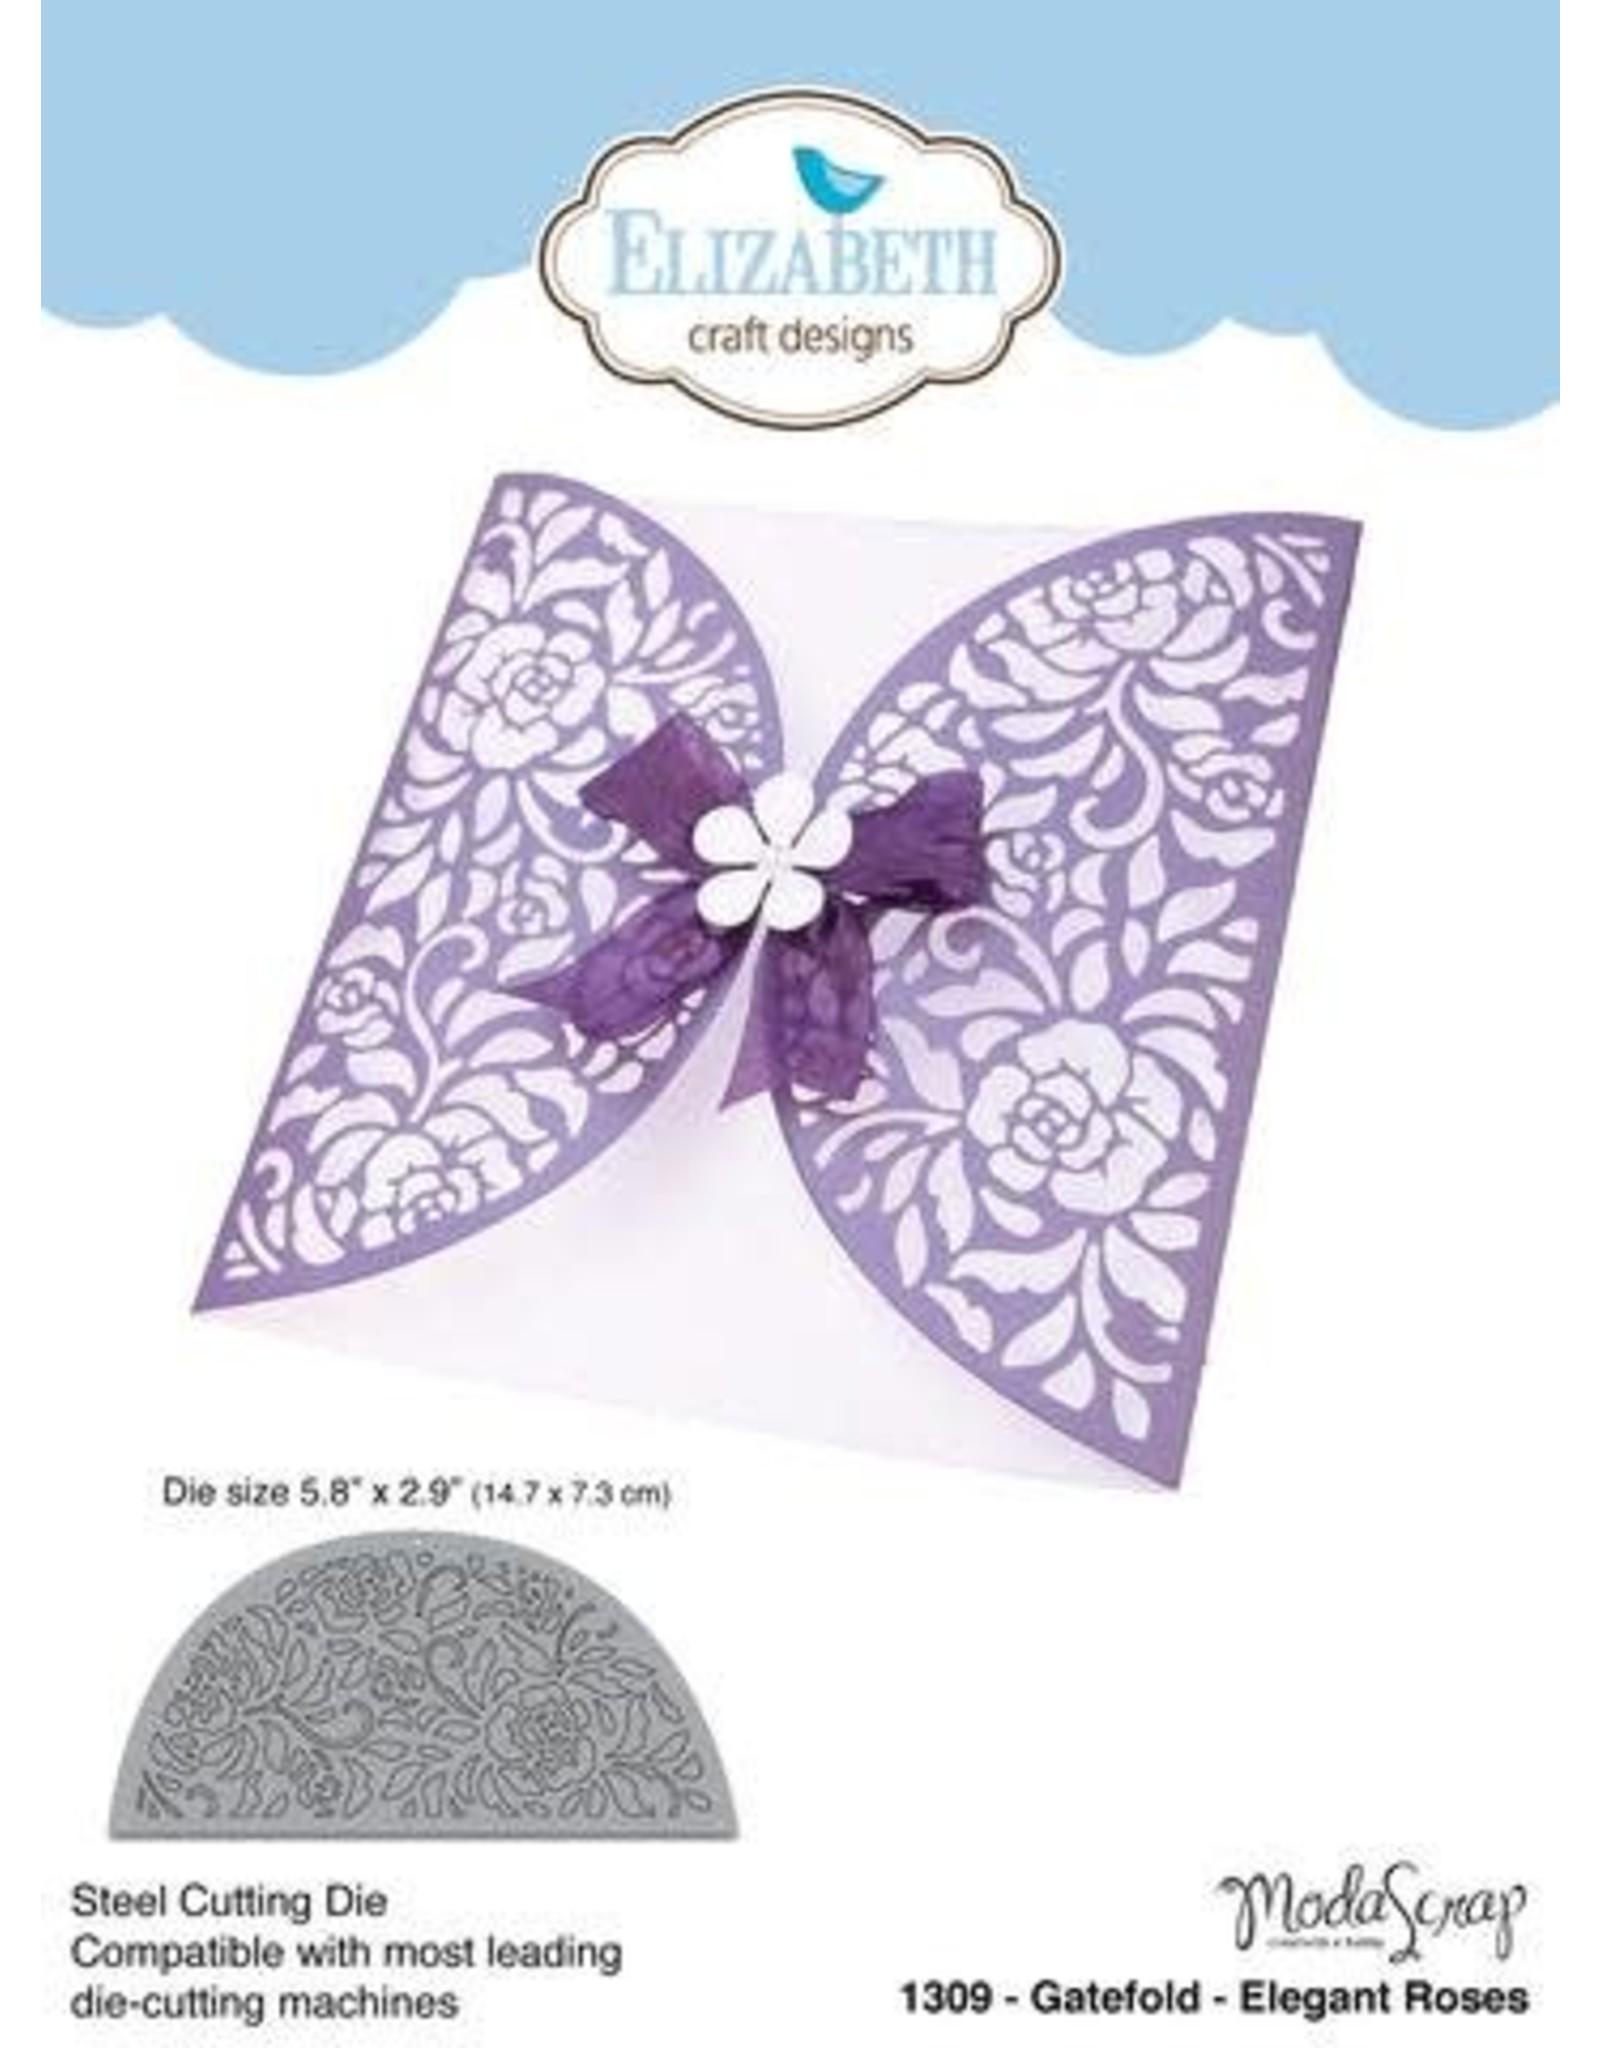 Elizabeth Craft Designs Elizabeth Craft Designs dies Gatefold - Elegant Roses 1309